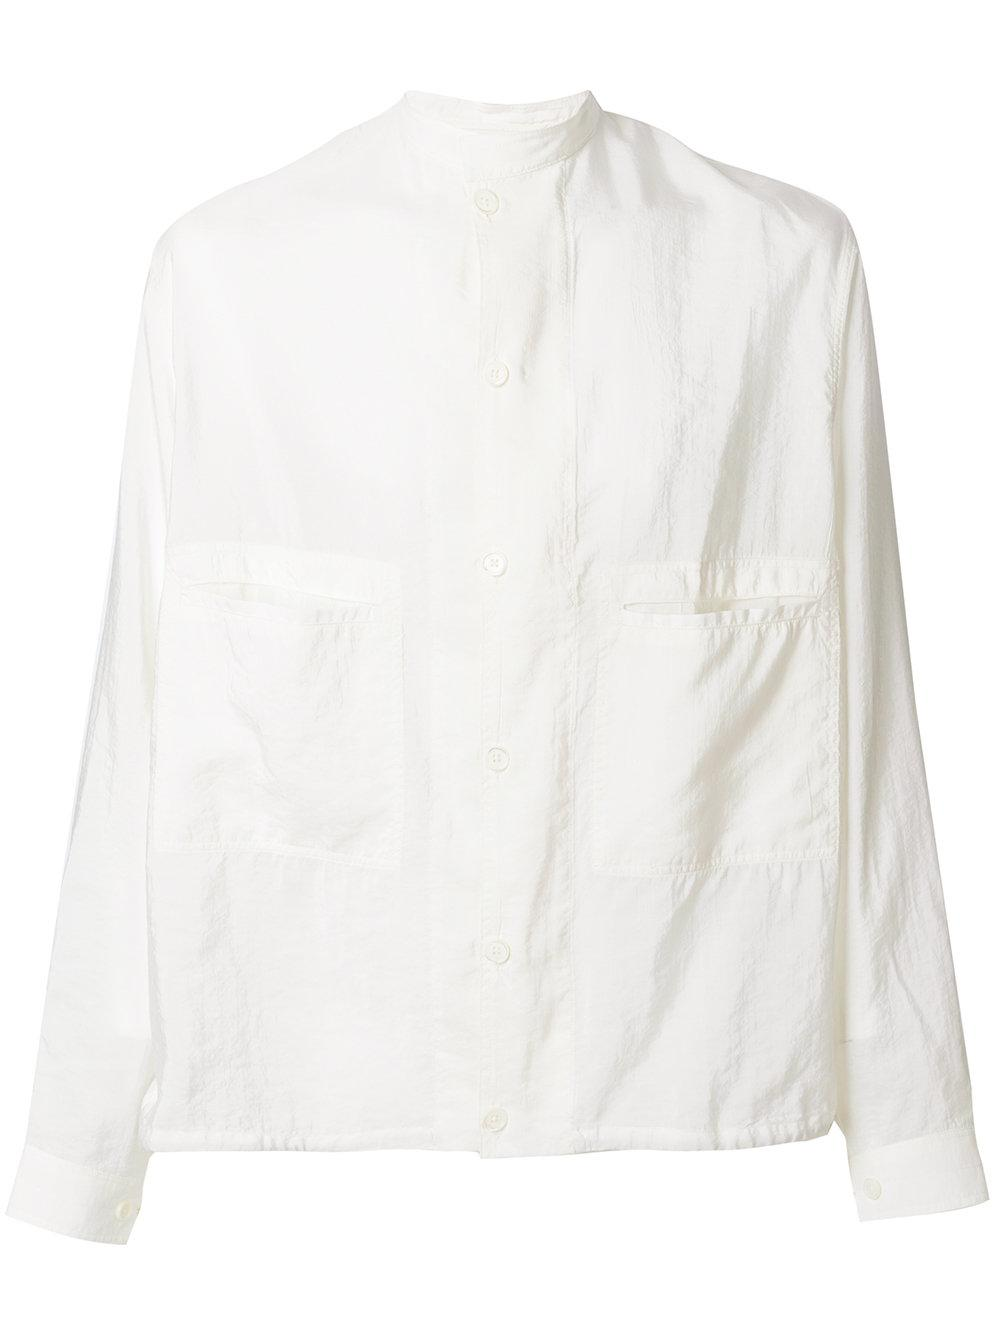 Lemaire Mandarin Collar Shirt